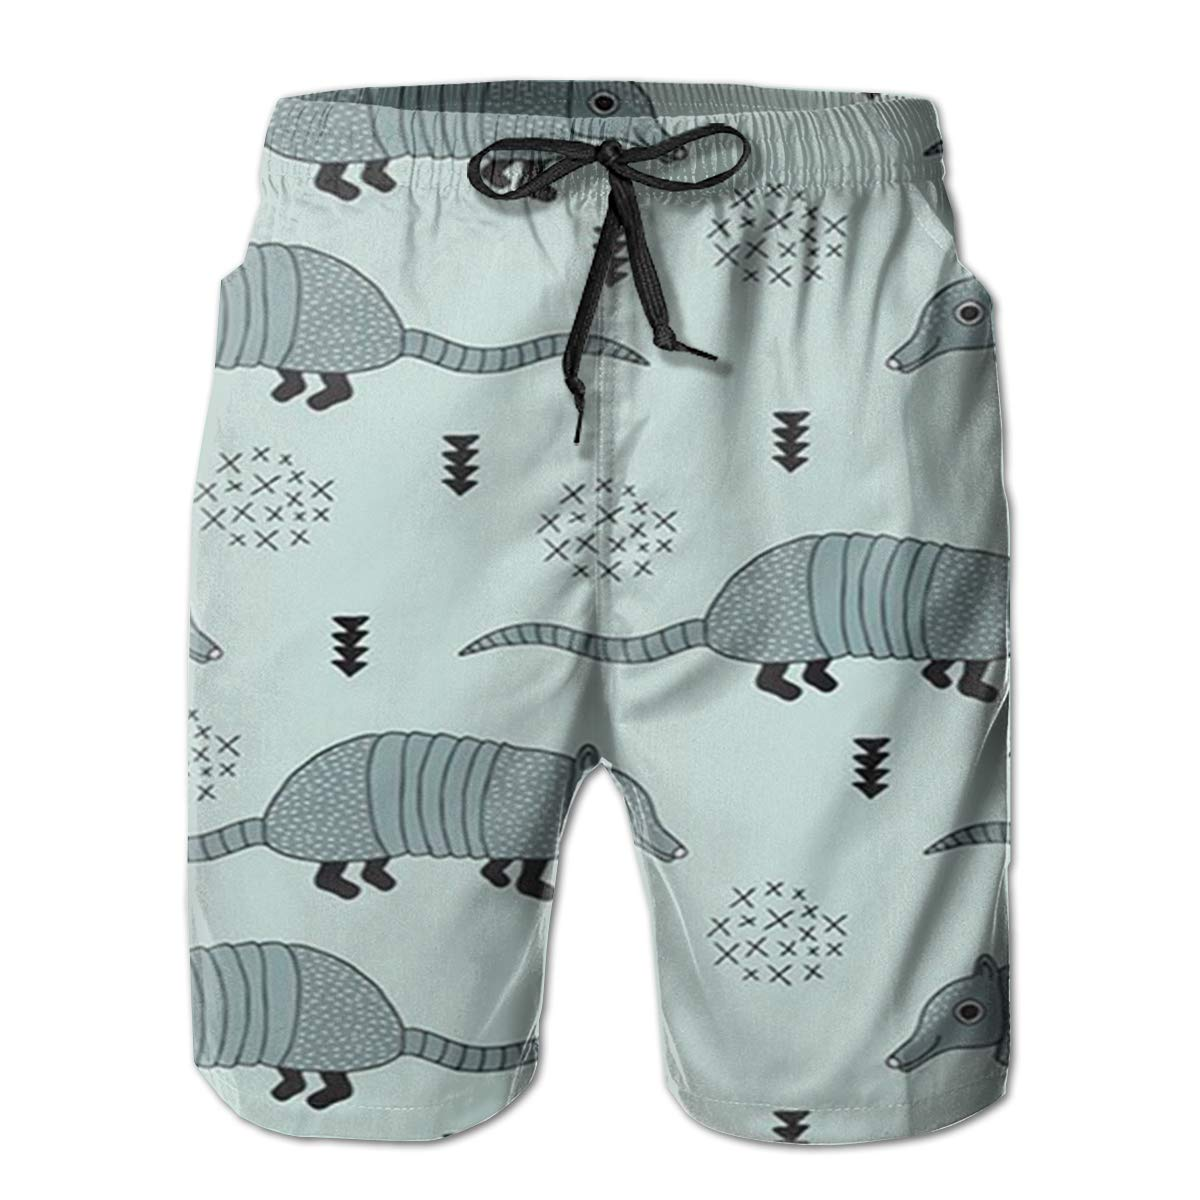 AMRANDOM Cute Armadillo Cactus Mens Drawstring Waist Swim Trunks Boardshort